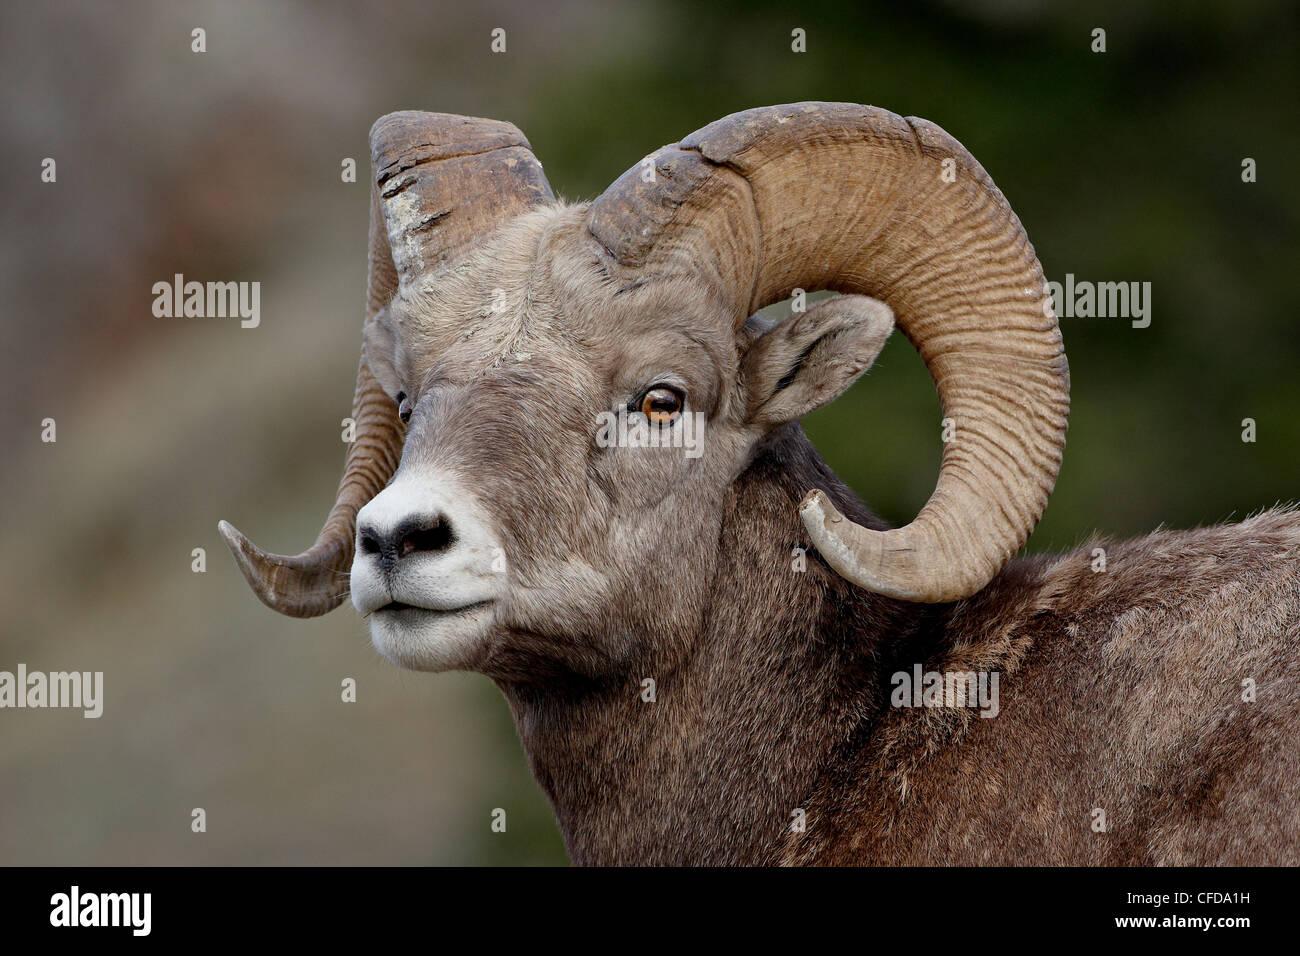 Bighorn sheep (Ovis canadensis) ram, Jasper National Park, Alberta, Canada, - Stock Image